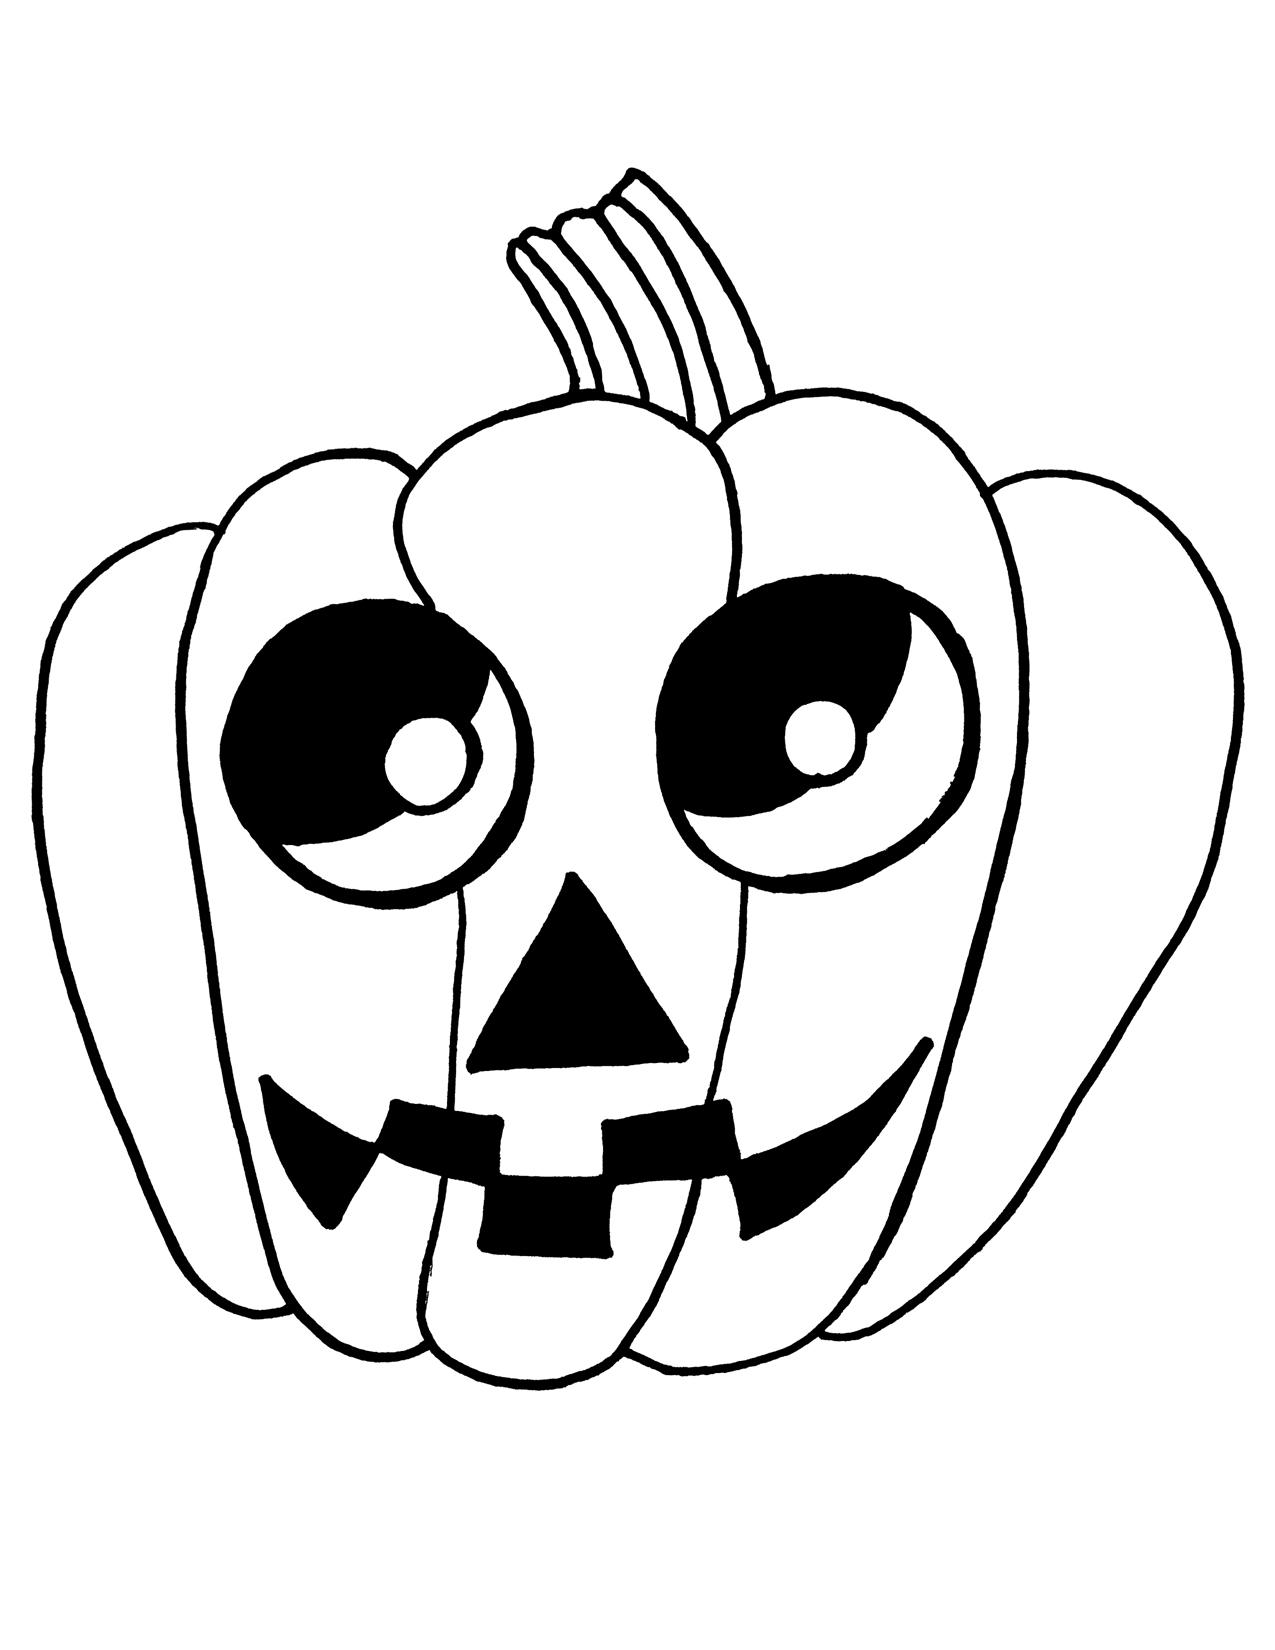 1275x1650 poketo blog last minute halloween costumes free mask downloads - Halloween Line Drawings